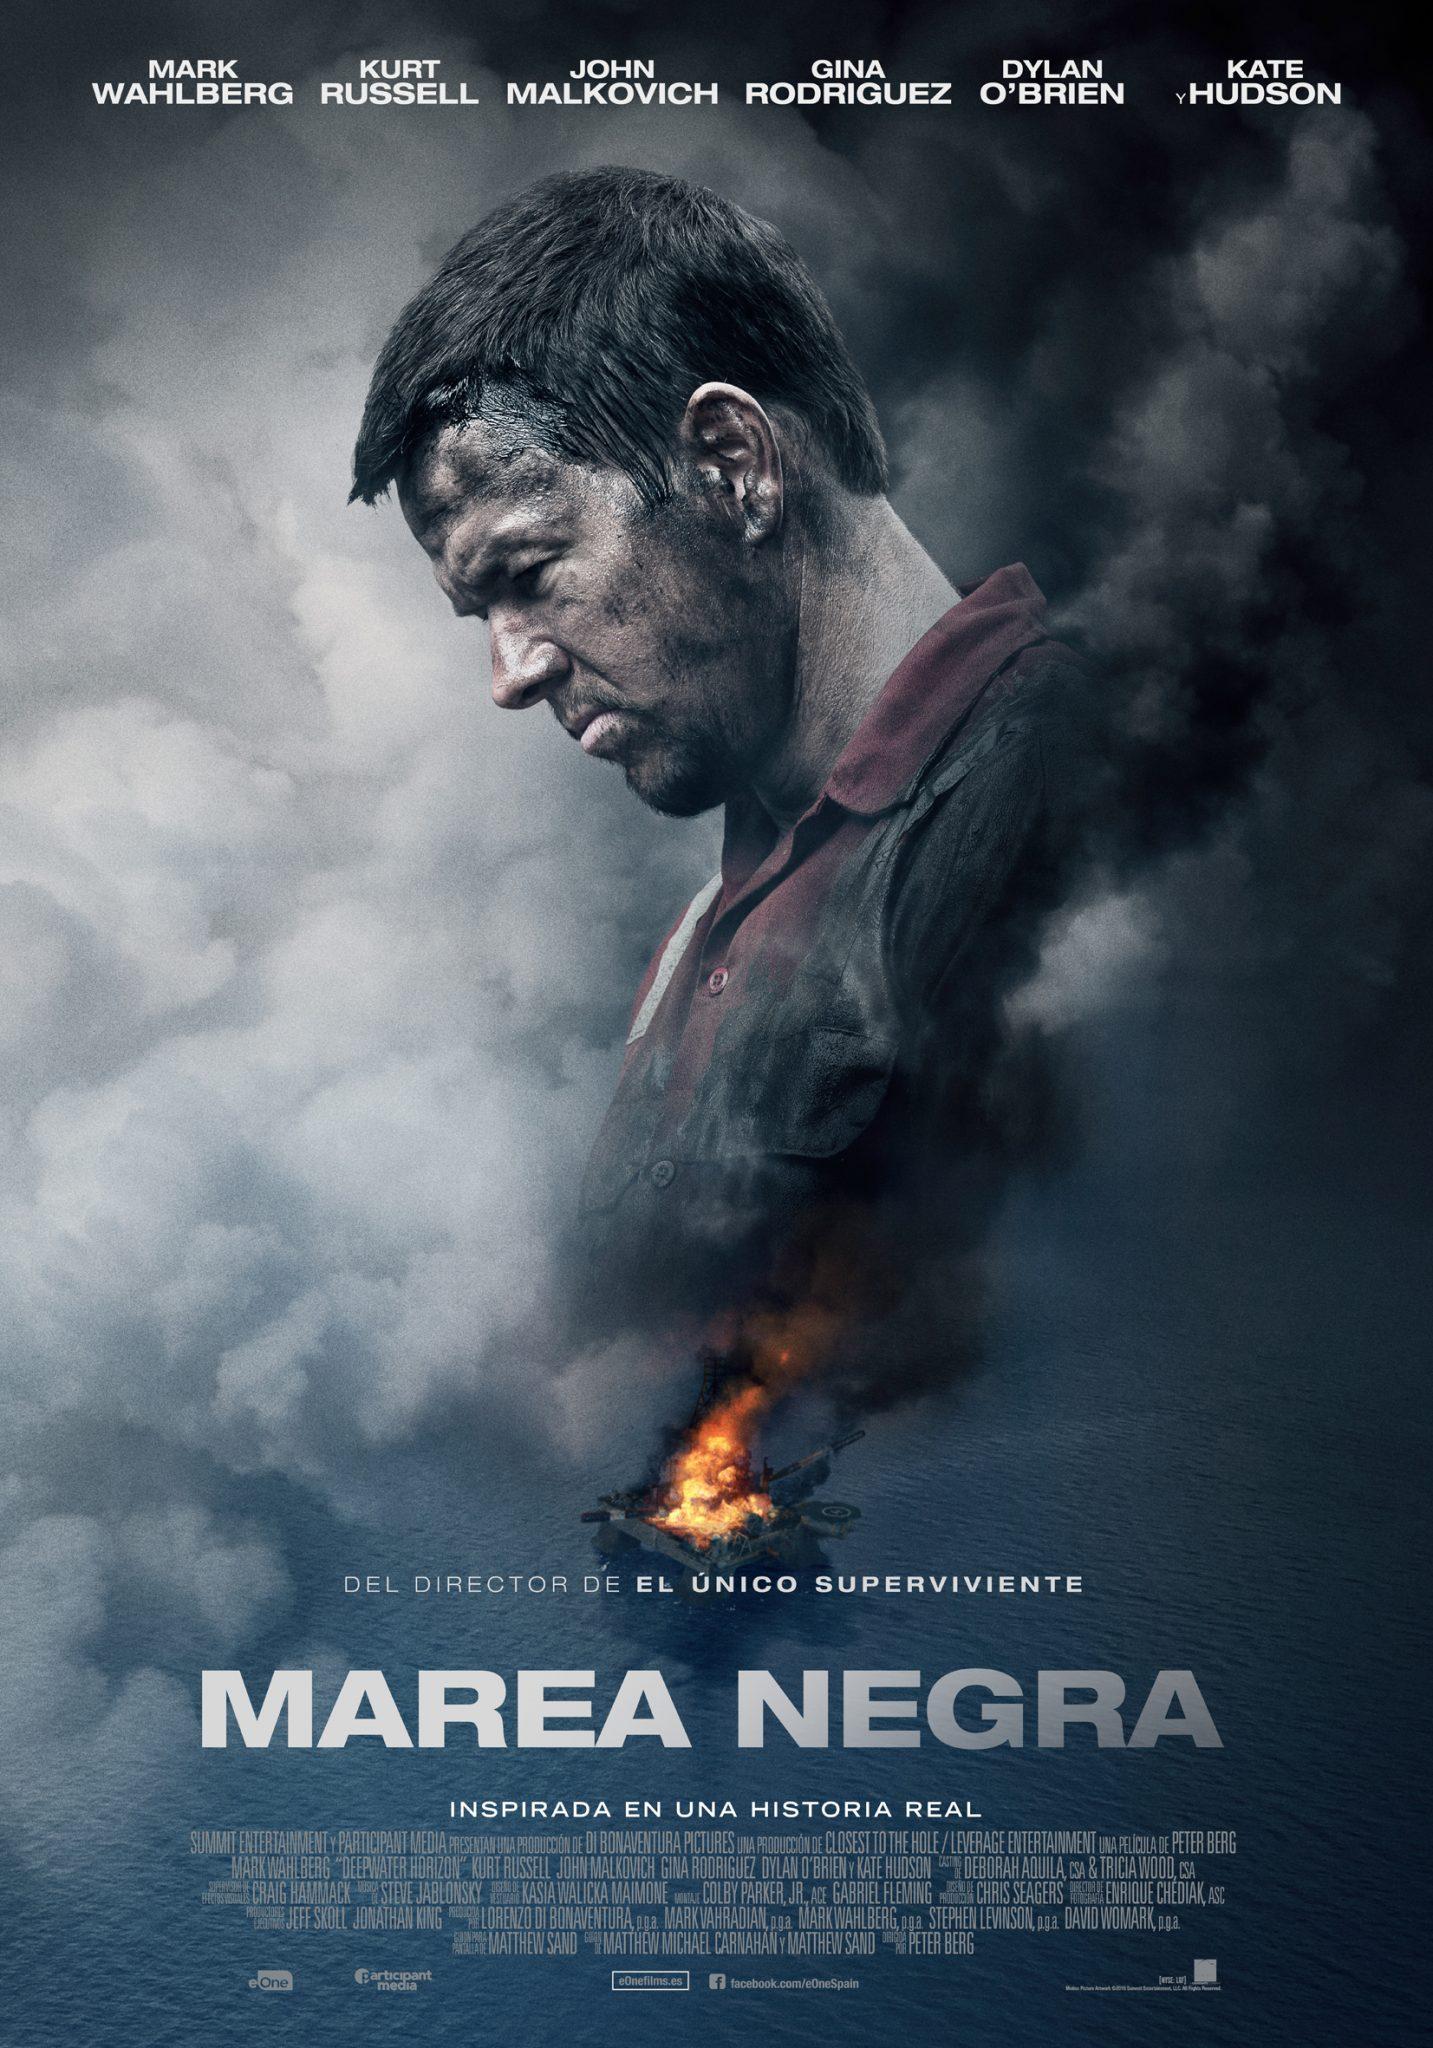 """MAREA NEGRA"" Cartel Final. Próximamente en cines"